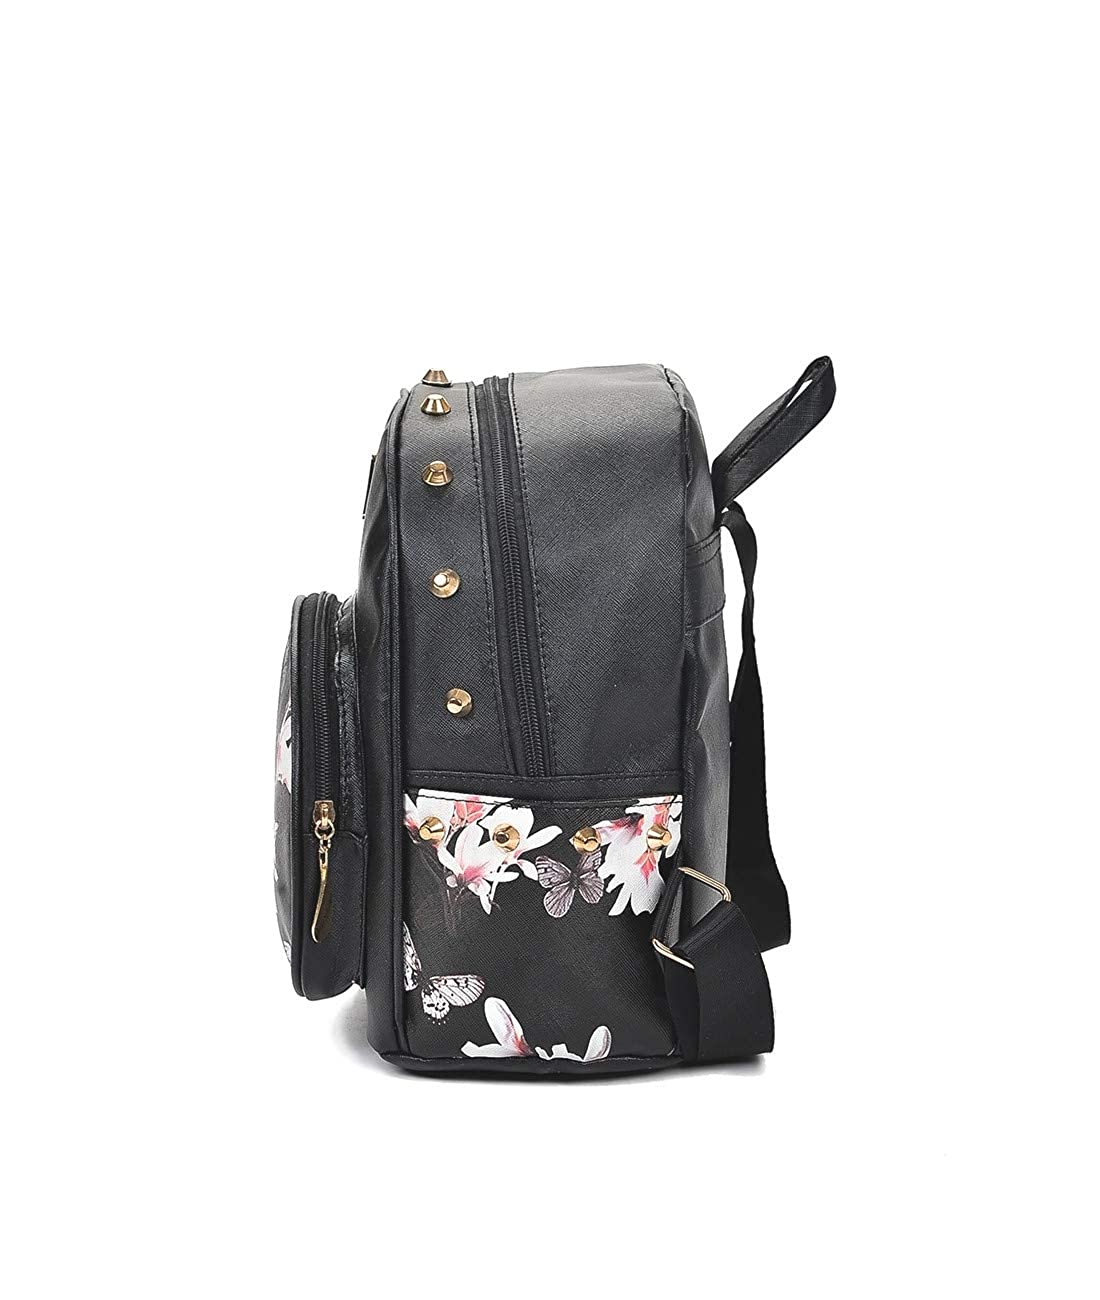 HARLAN Womens Backpack Fashion Flower Print Rivet Decor Mini All Match Daily Bag